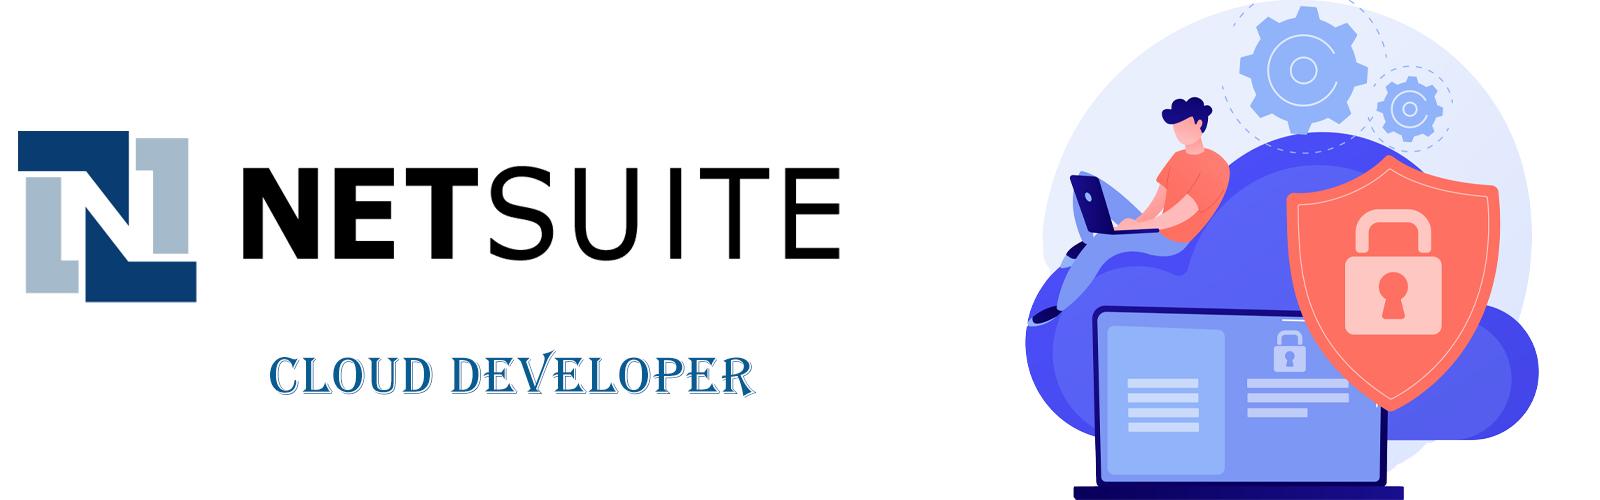 Netsuite Cloud Developers